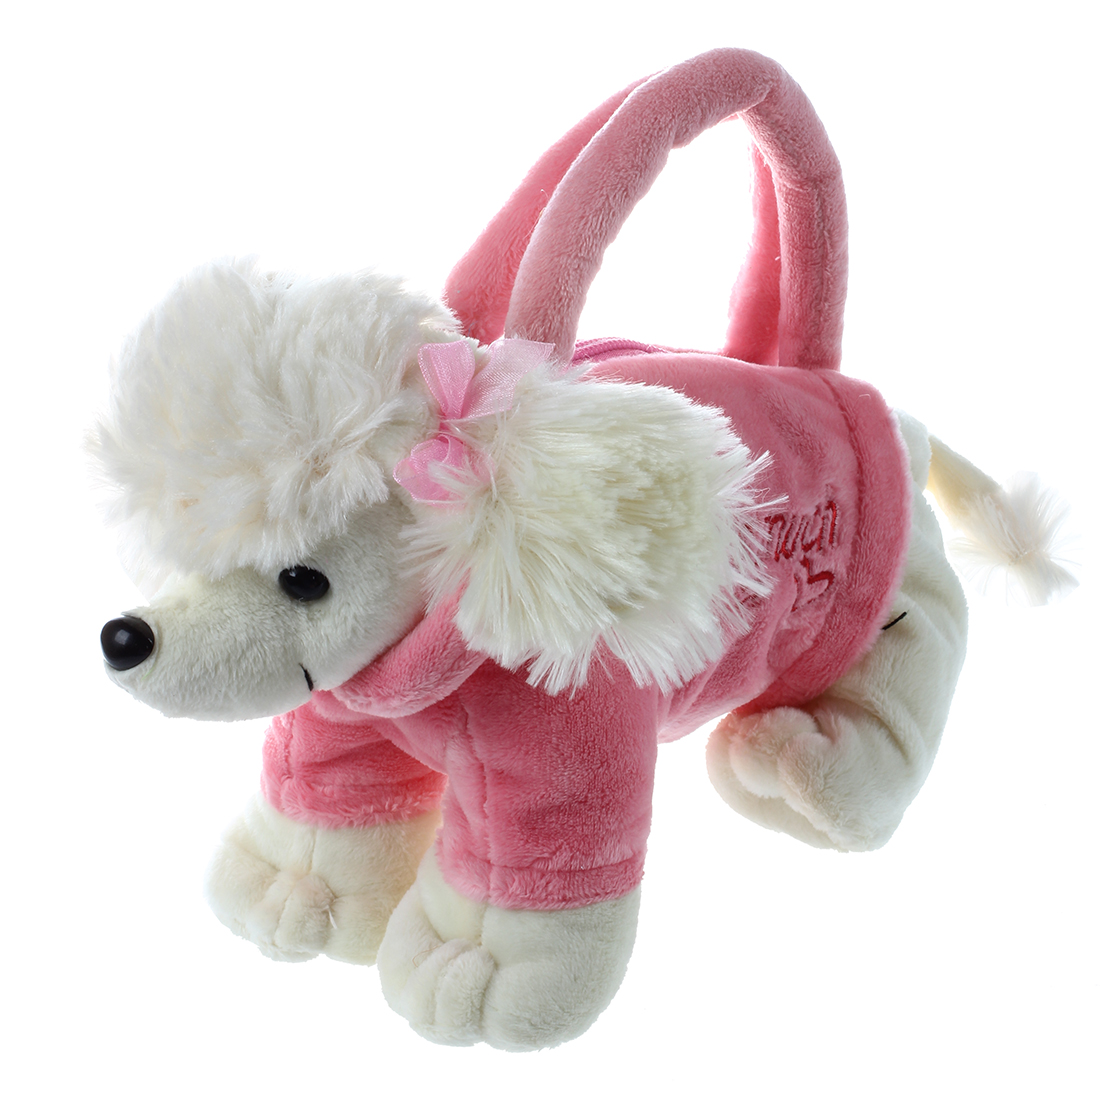 Cute stuffed animal doggie bag Shape children handbags girls Handbag Gift for Children kids bags The bear bags for girls Boys dg подушка с собачкой mickey doggie